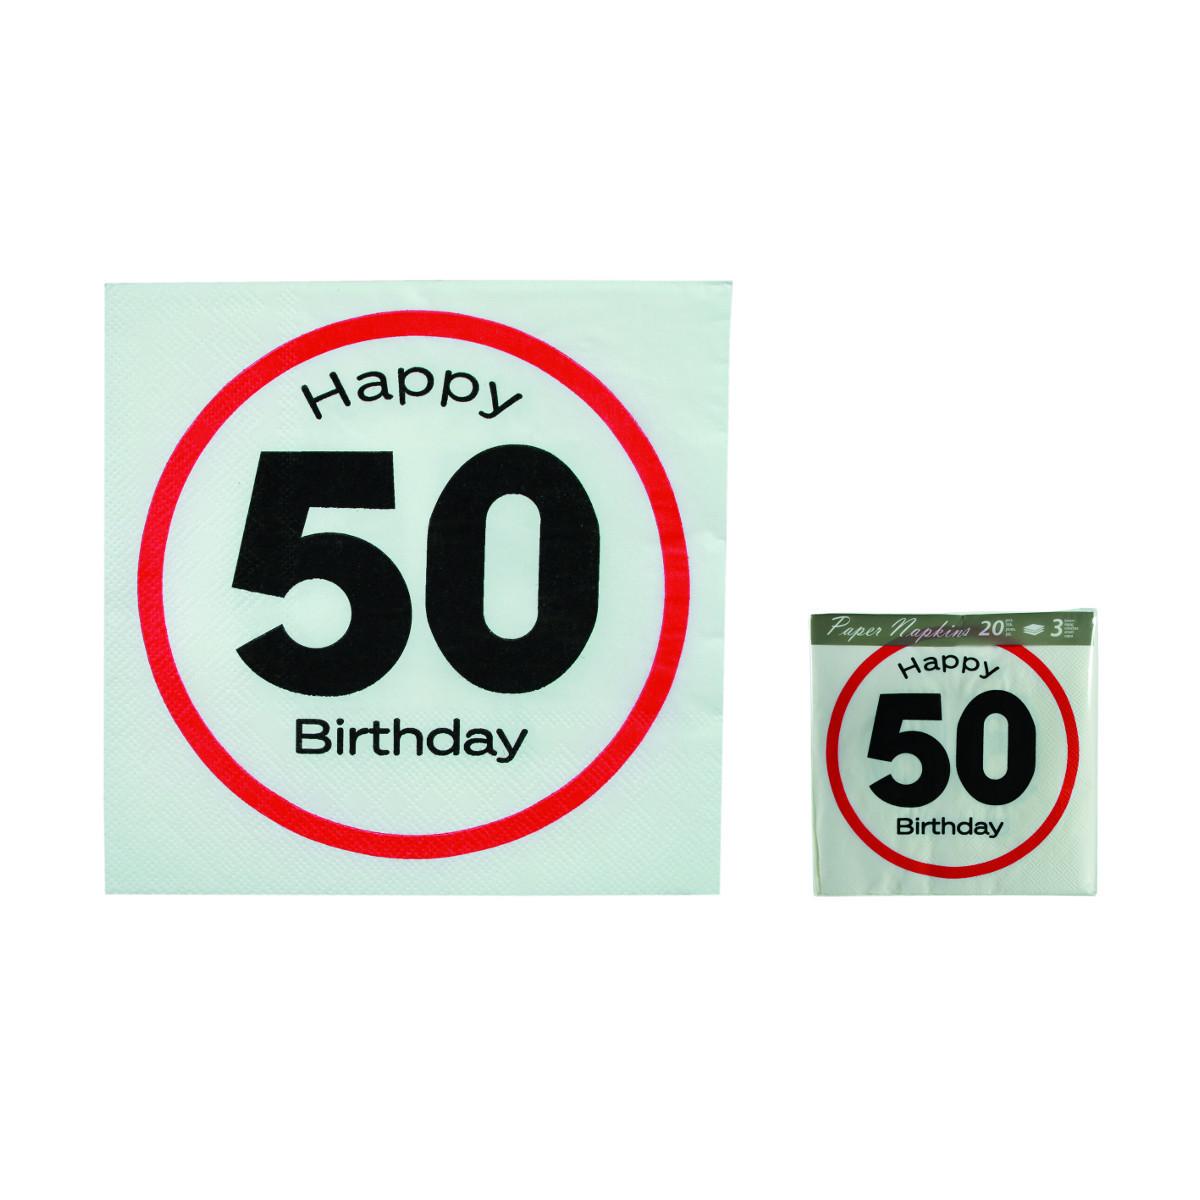 Happy Birthday napkins street sign